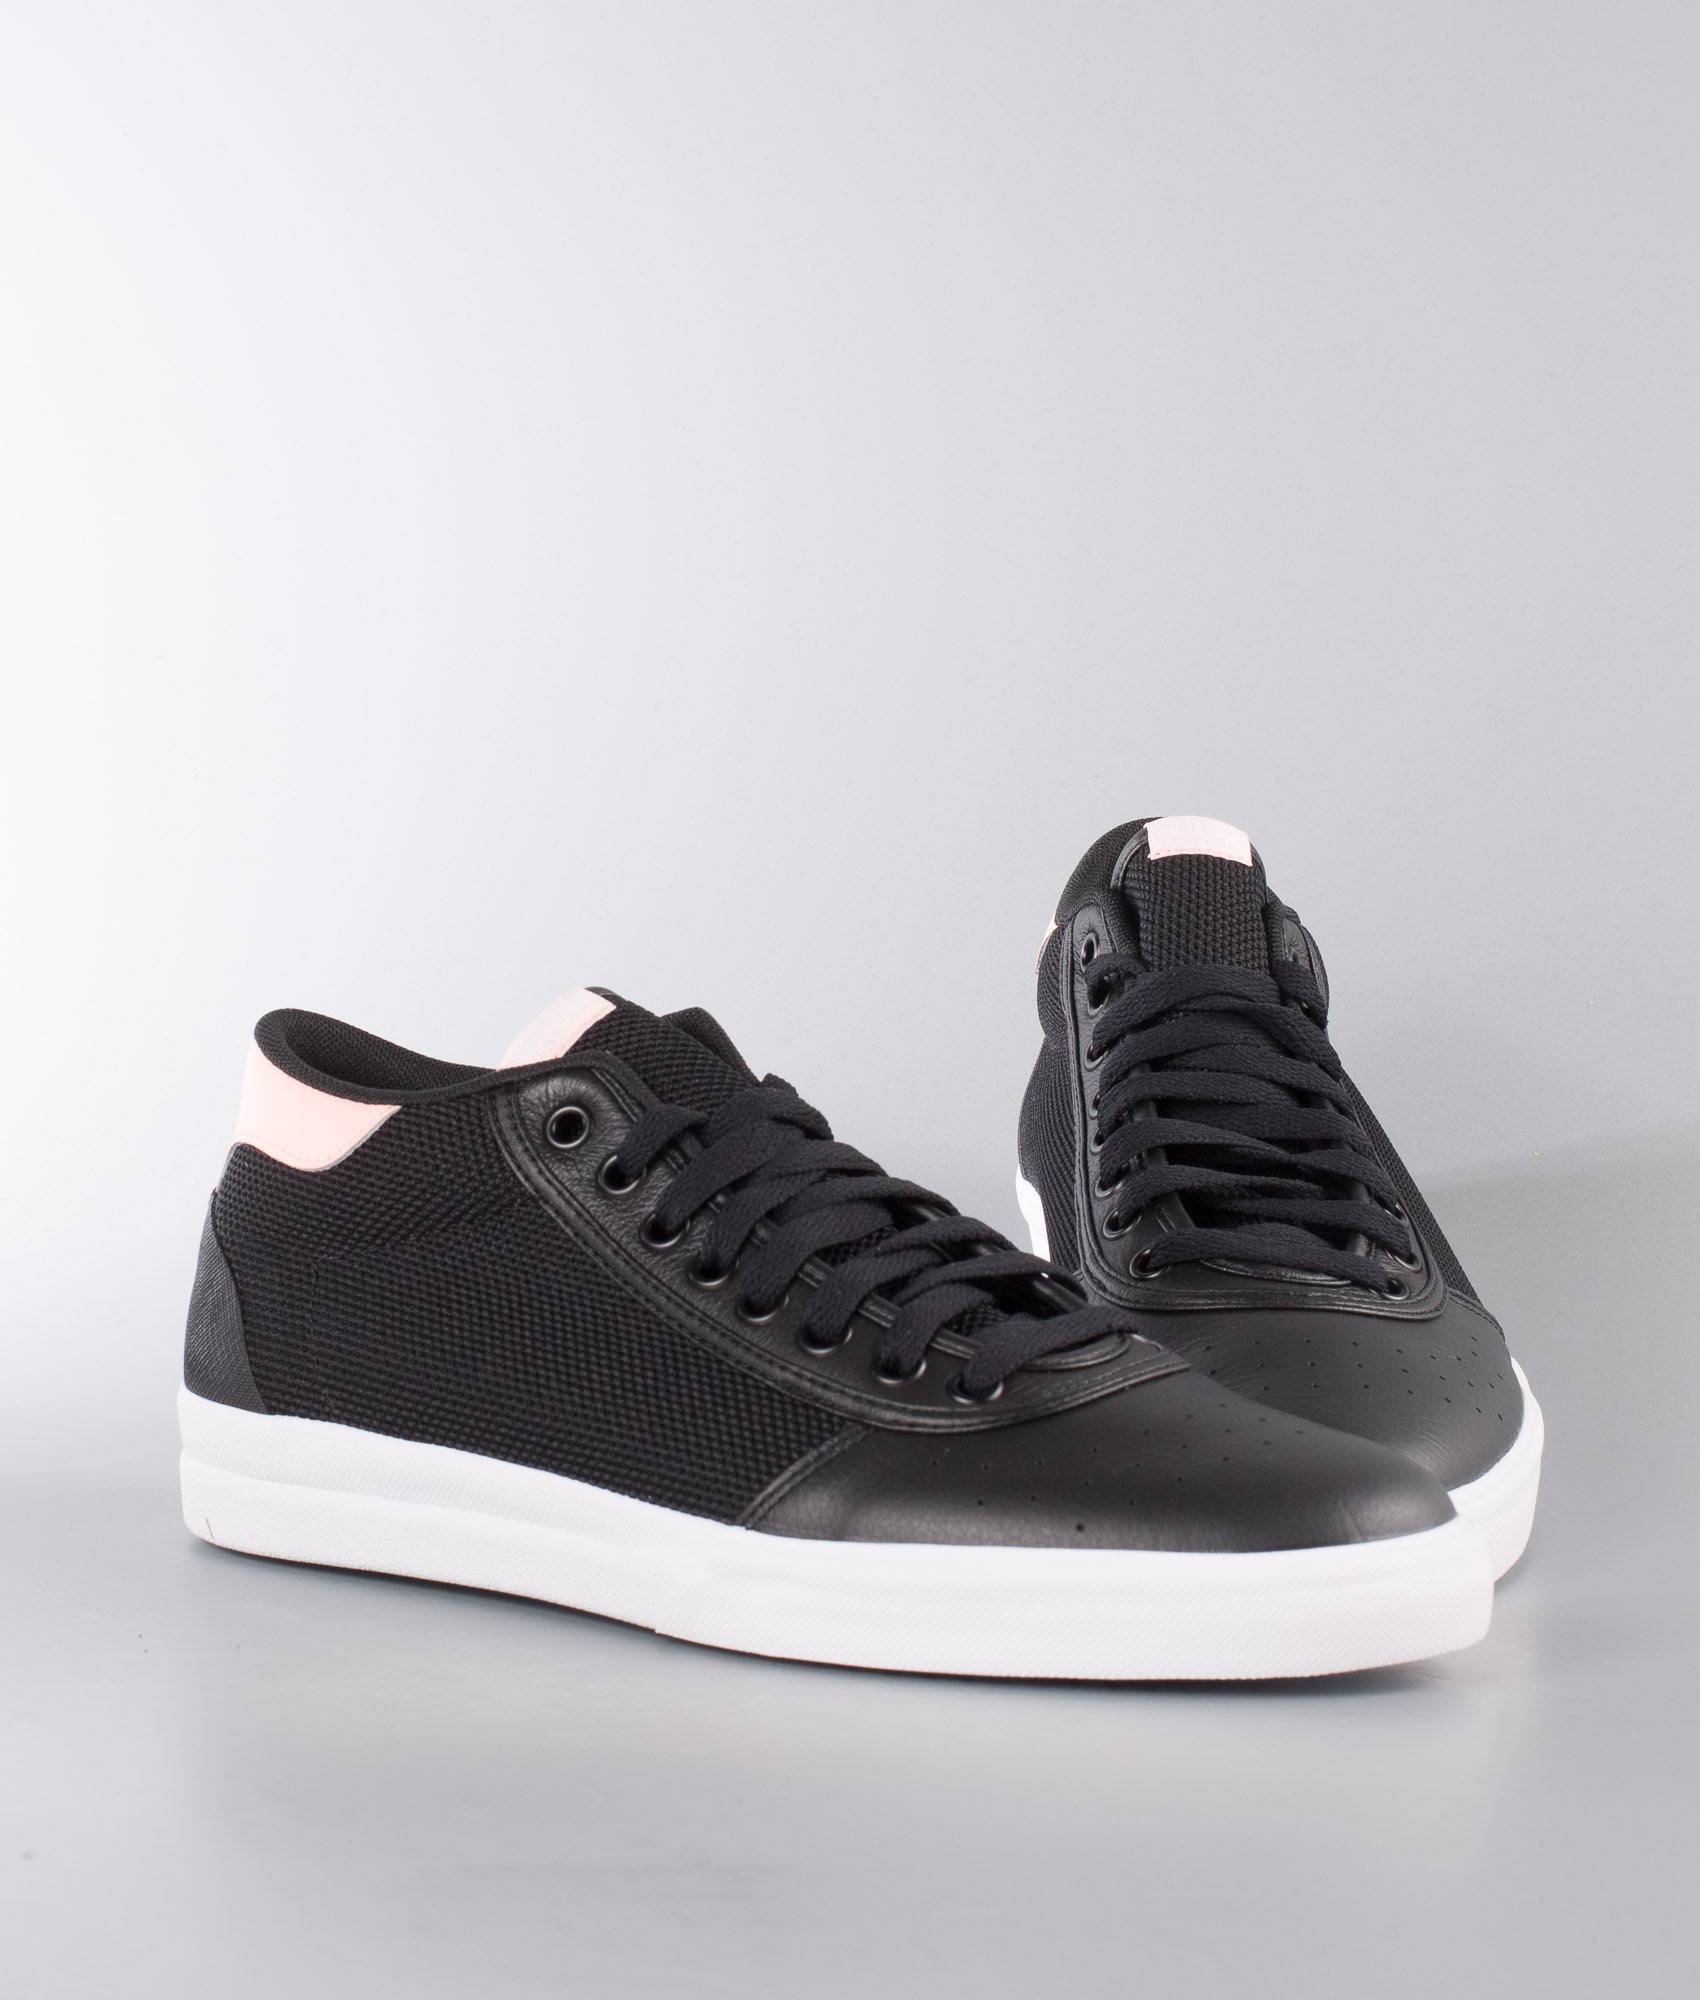 Schuhe Mid Core Blackftwr Lucas Skateboarding Premiere Adidas Whitehazcor IfyYv7b6gm